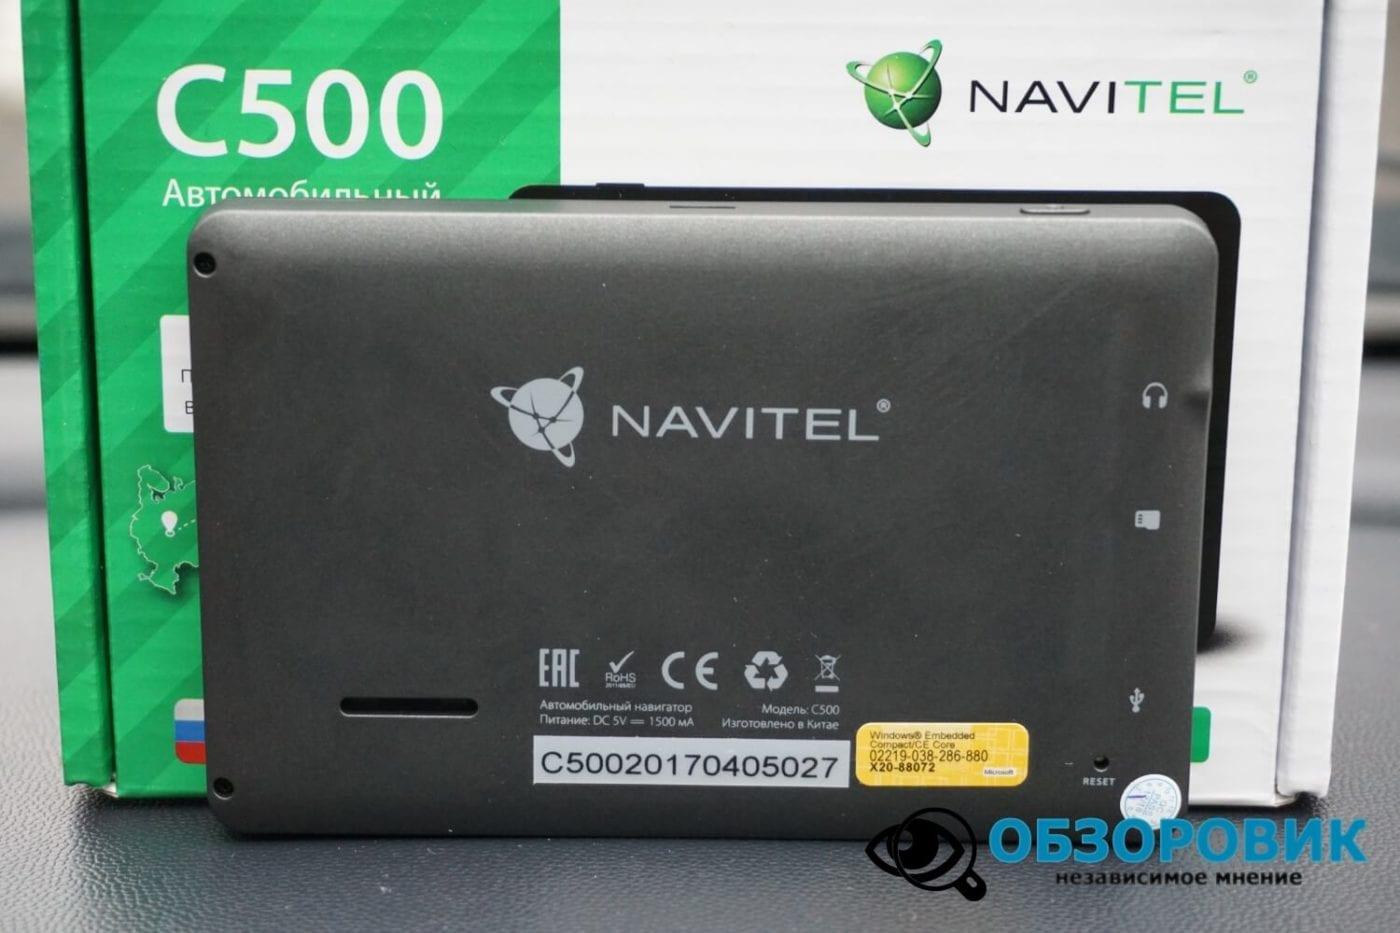 Обзор навигагора NAVITEL C500 19